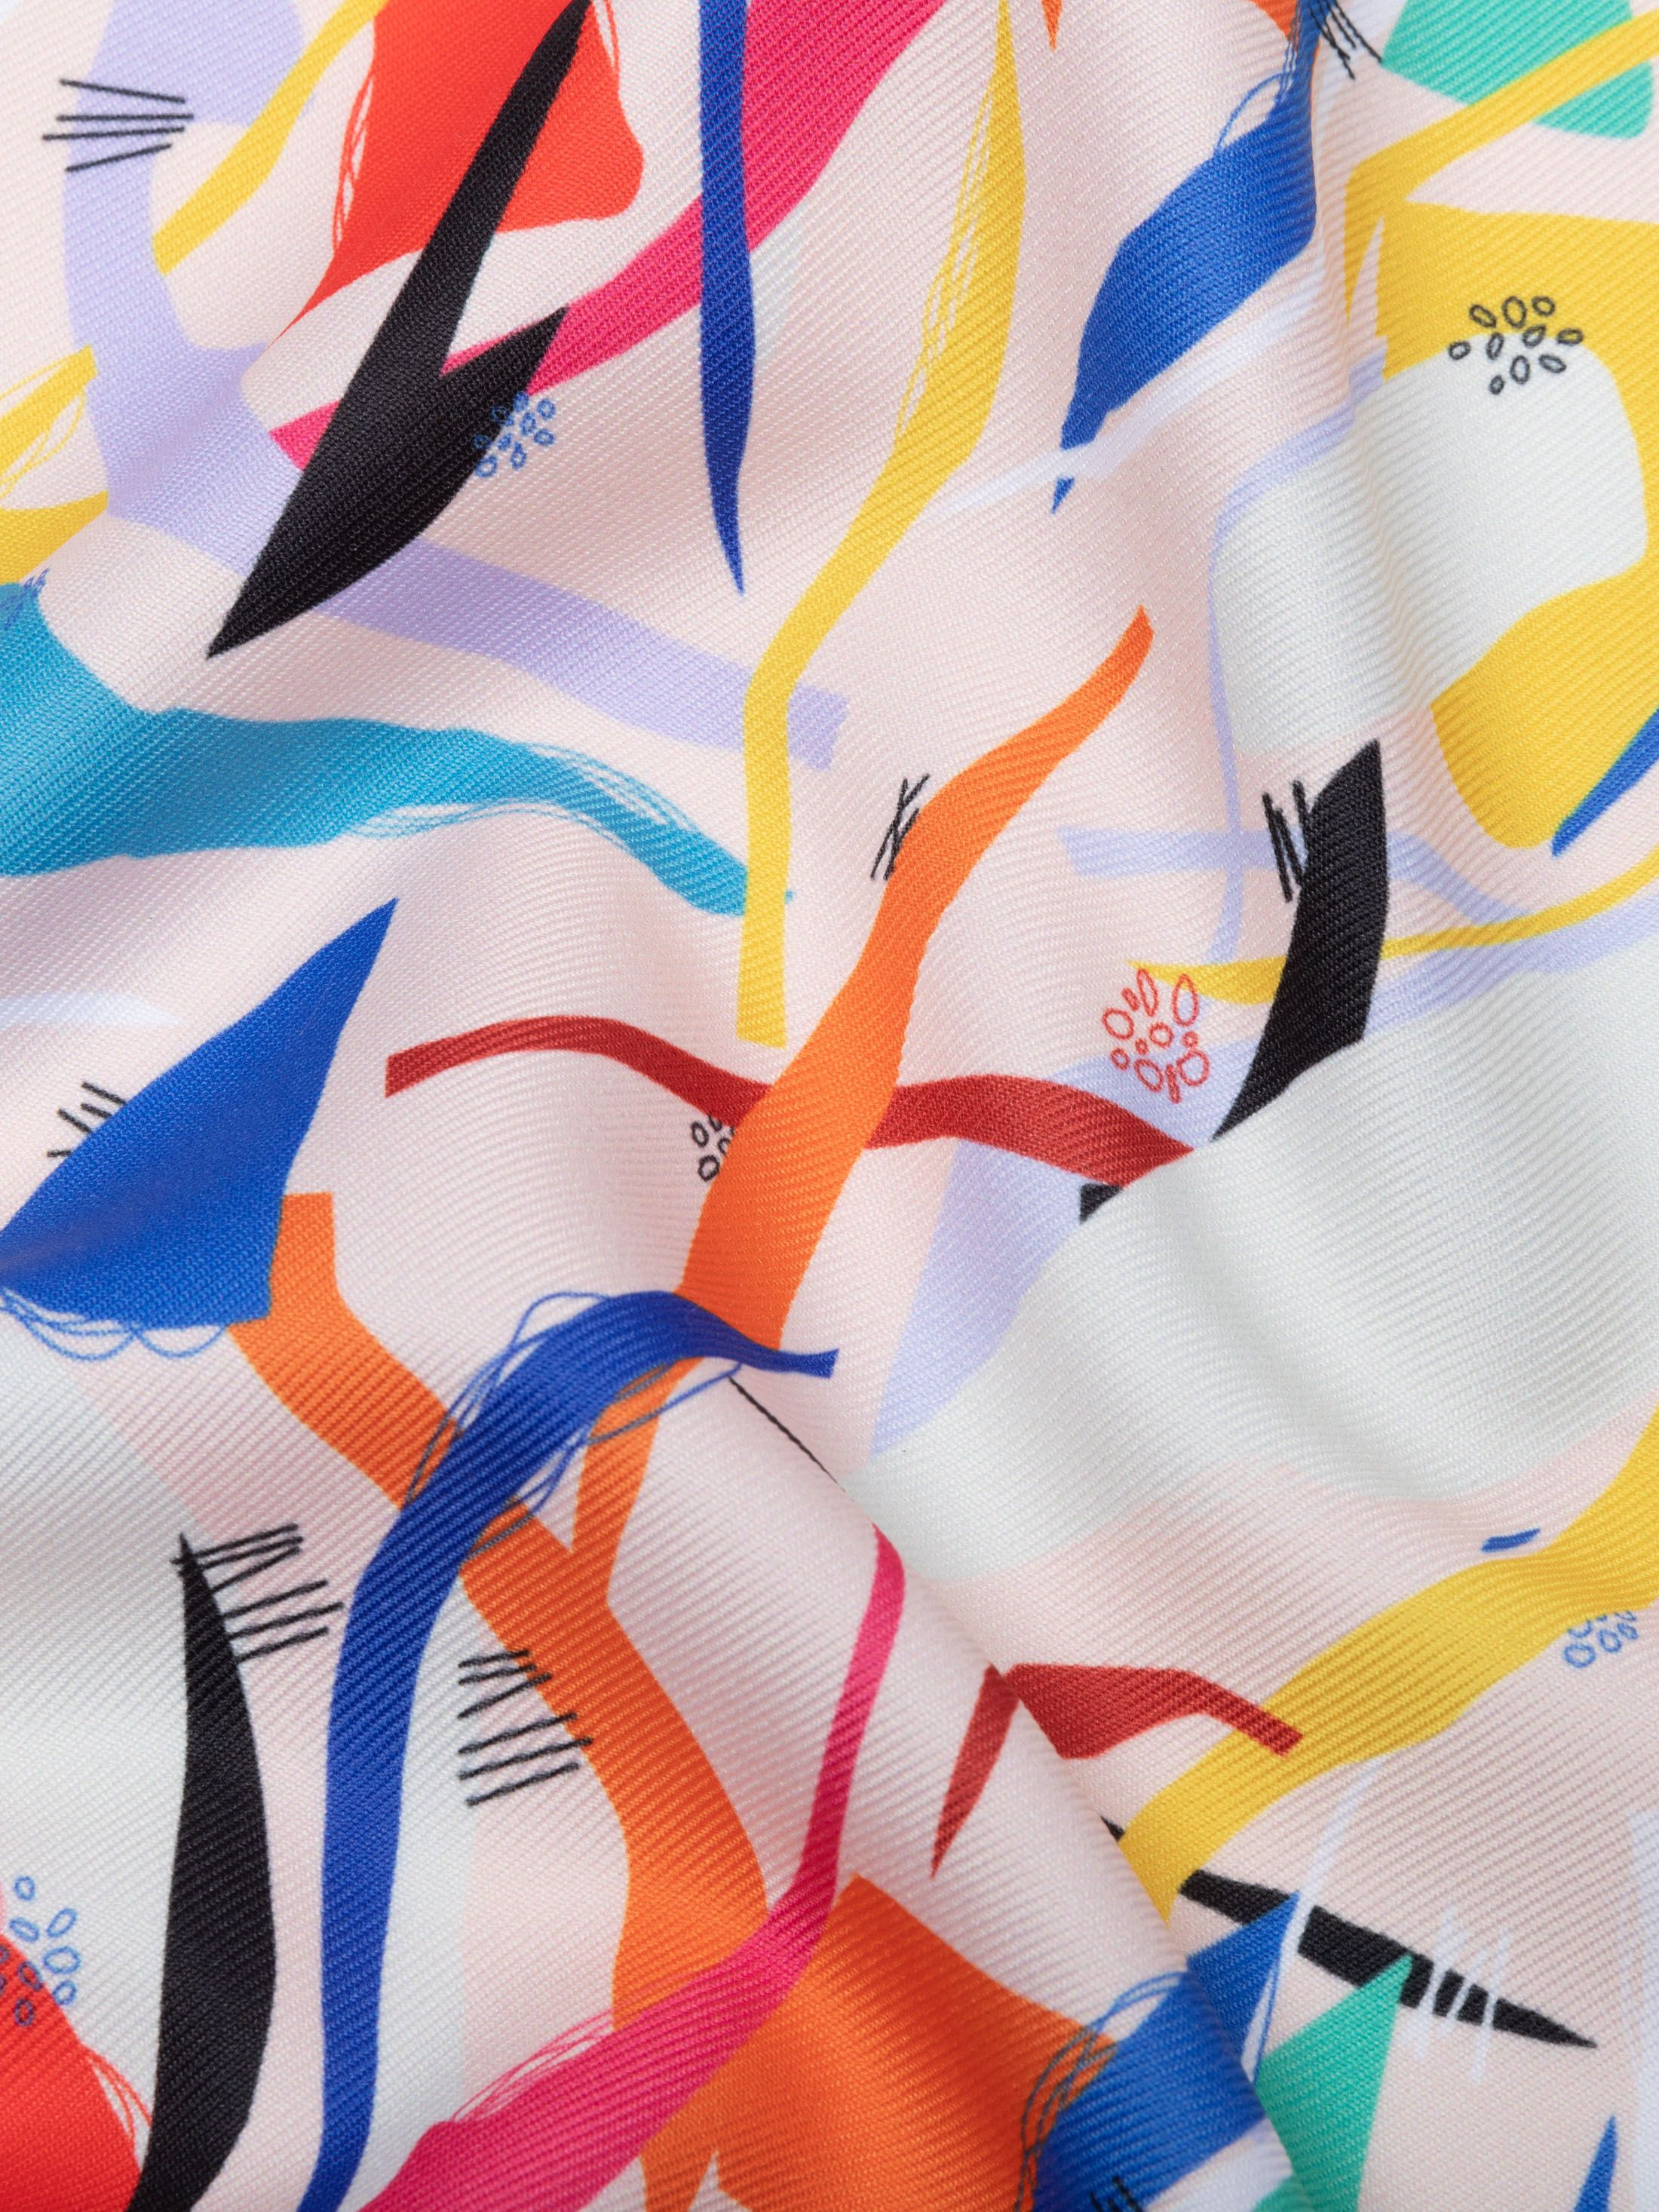 printing on poly twill fabric